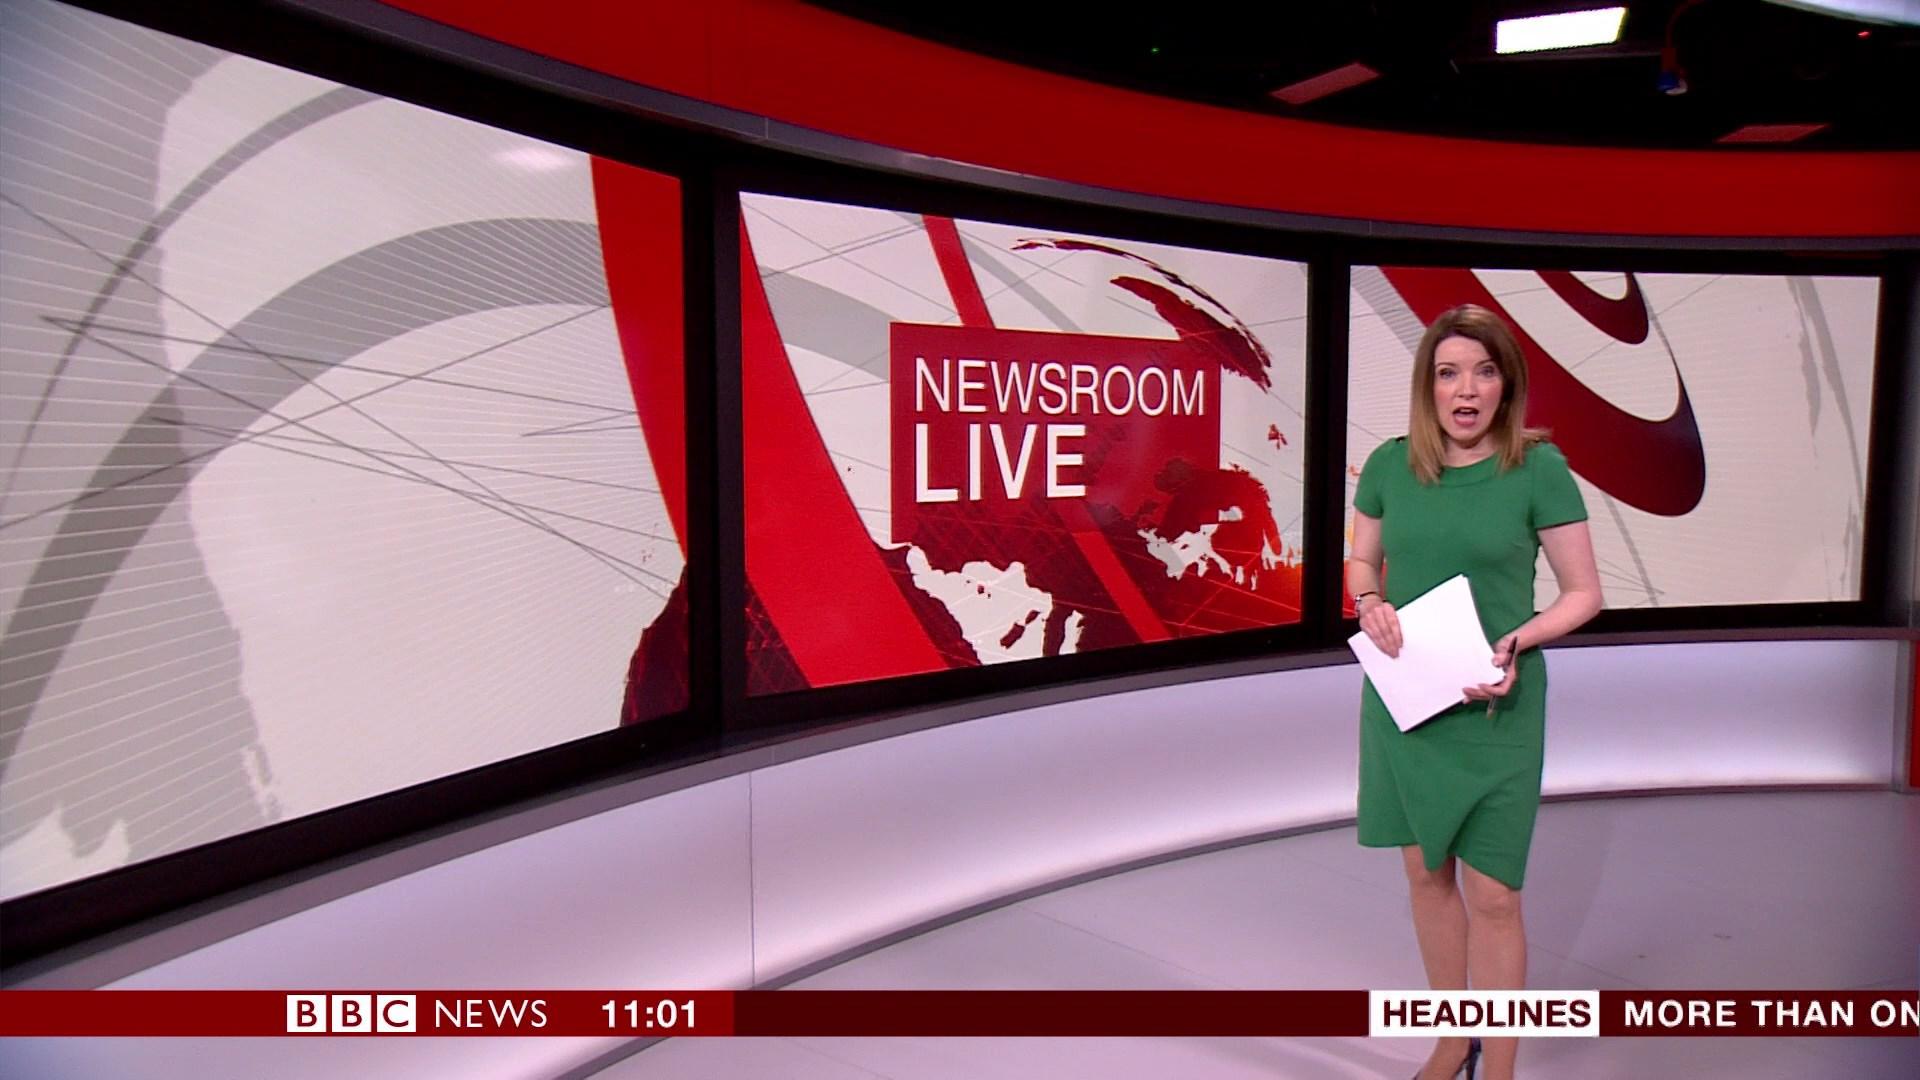 61842116_bbc-newsroom-live_20180117_11001130-ts_snapshot_02-12_-2018-01-17_12-56-35.jpg